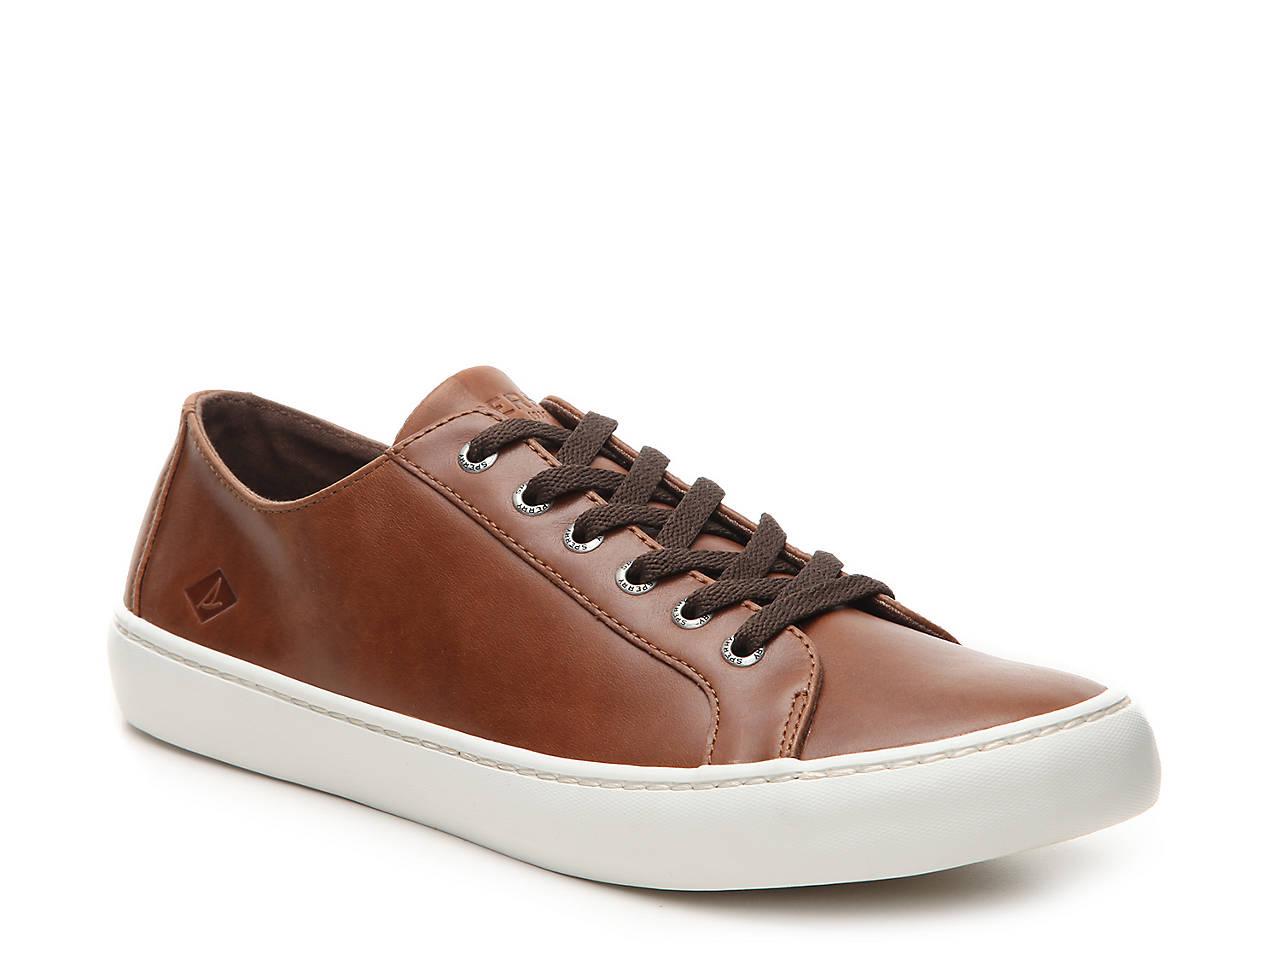 71f29d1b002 Cutter Sneaker